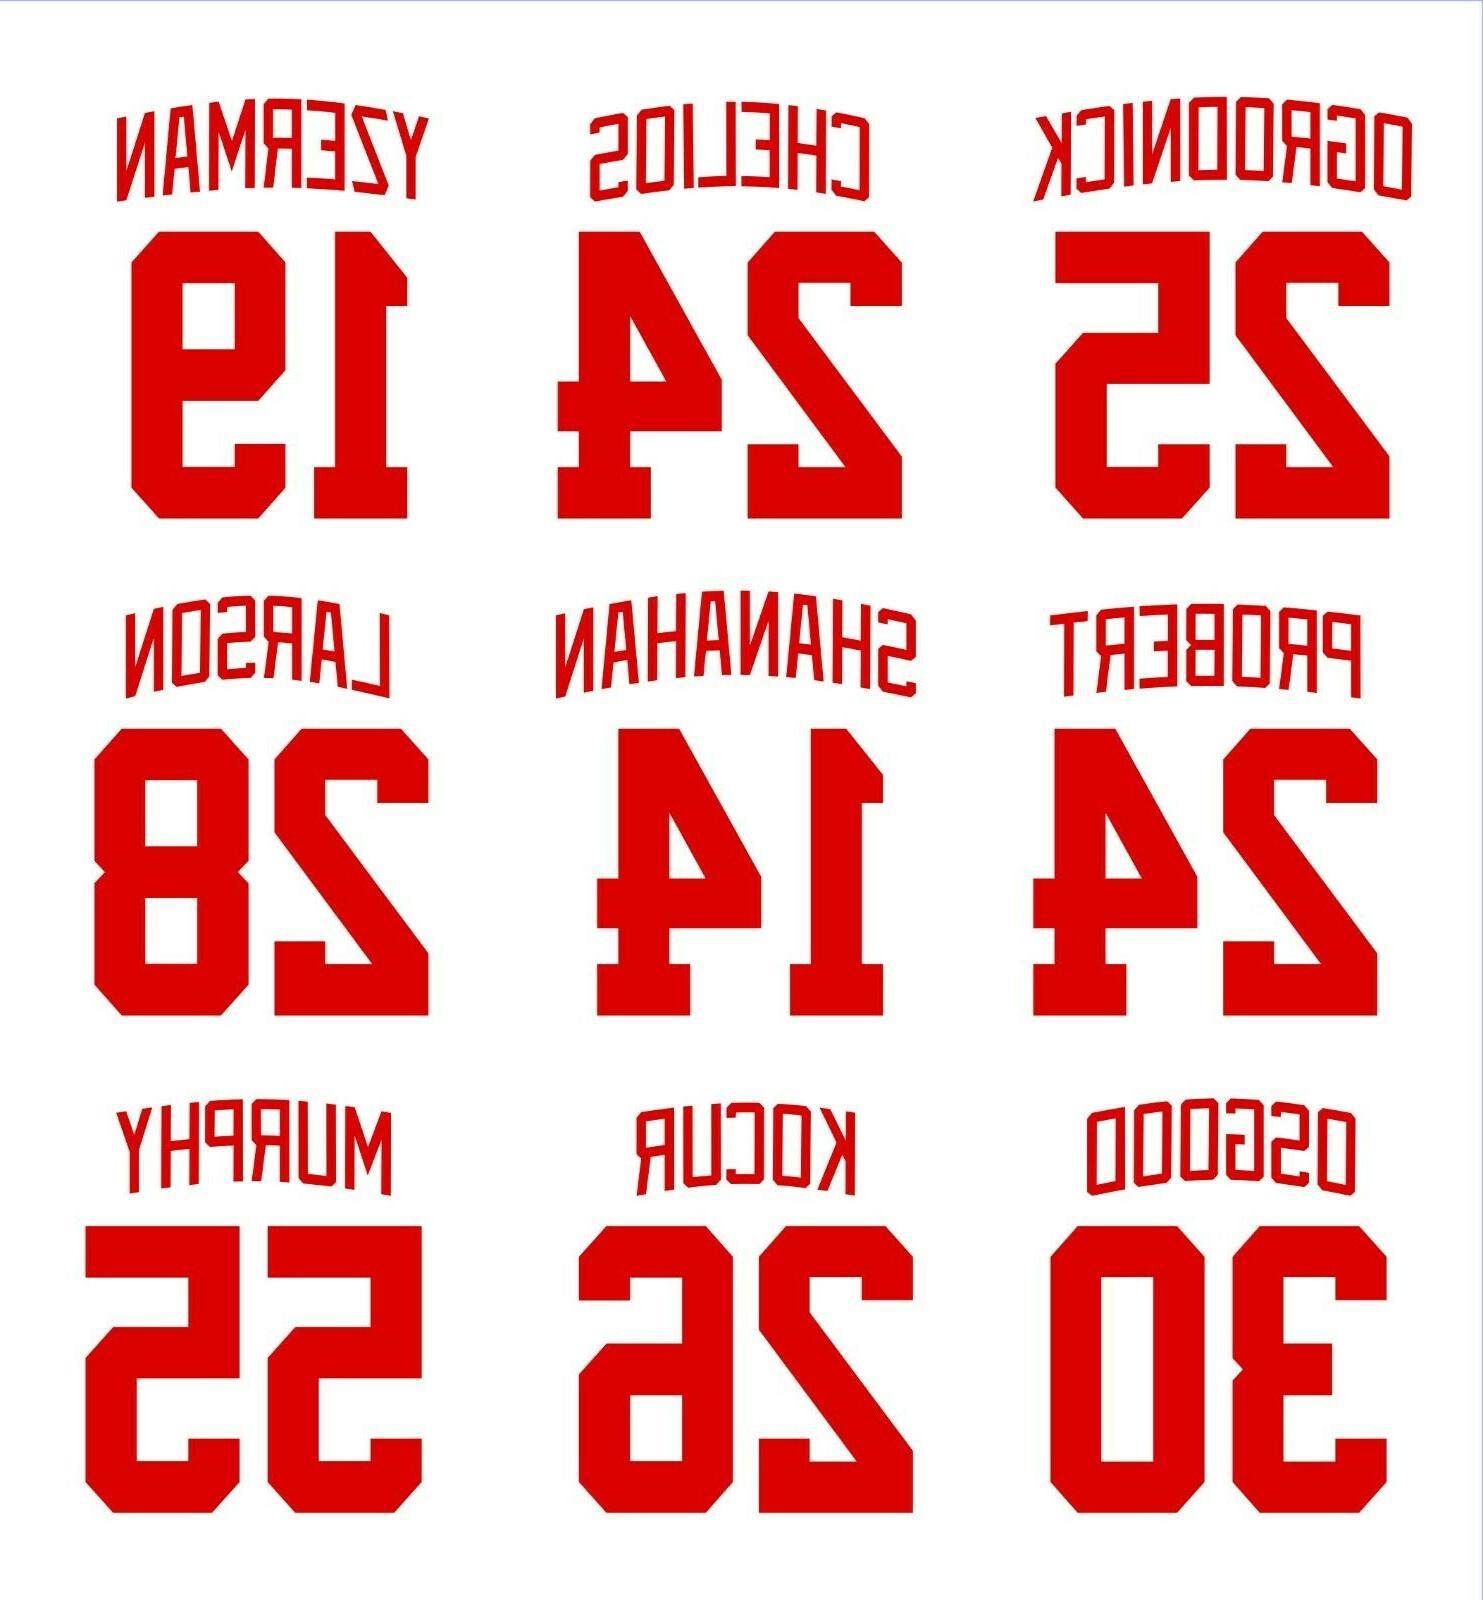 detroit red wings sticker decal yzerman shanahan